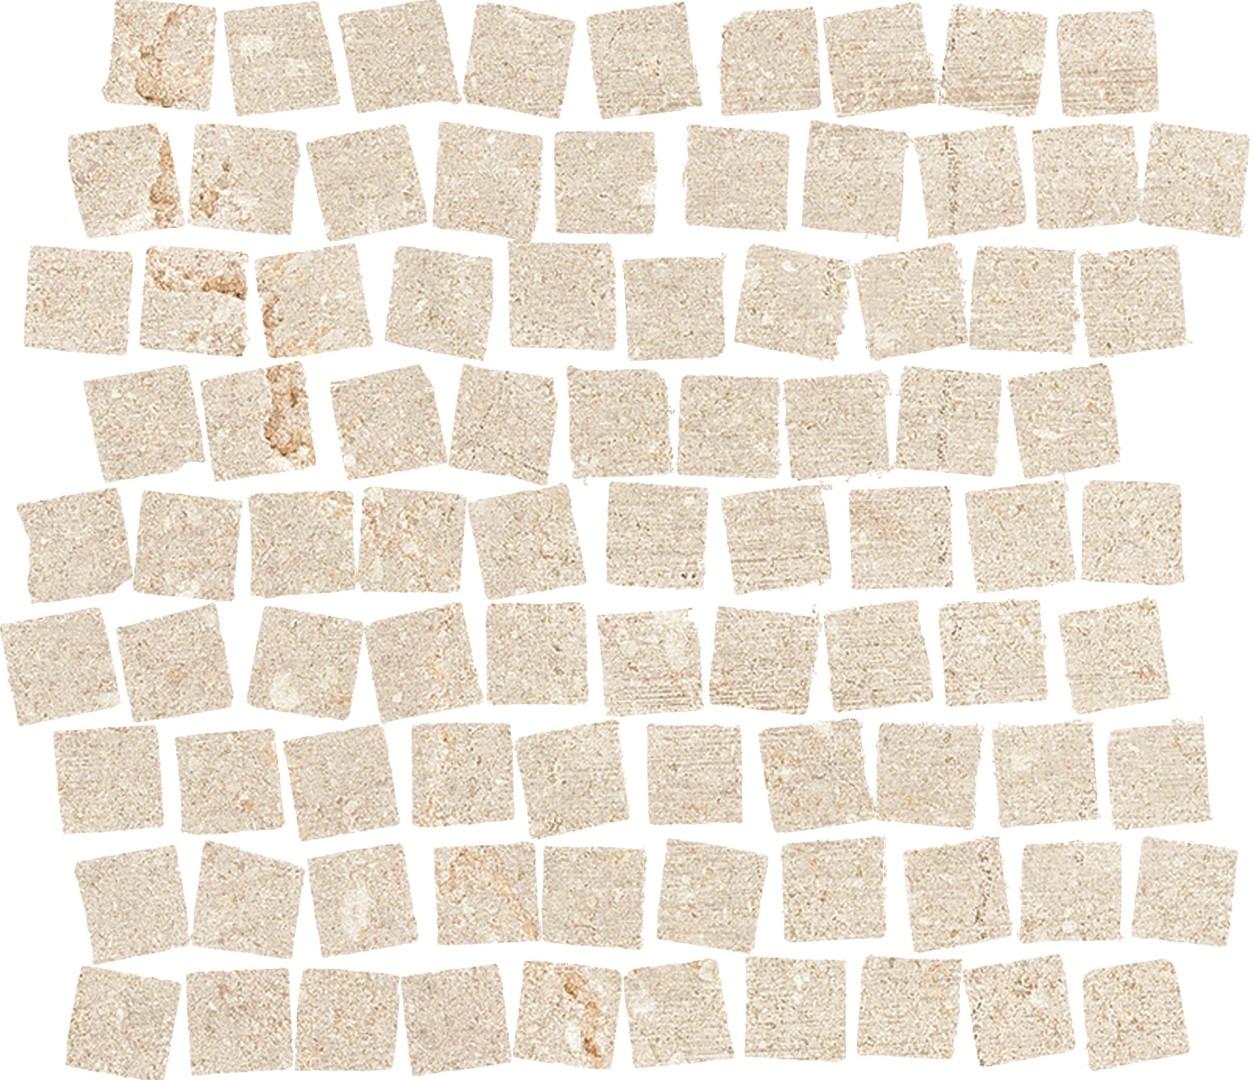 Obklad Mosaico Sand 32,5x32,5 cm, mat